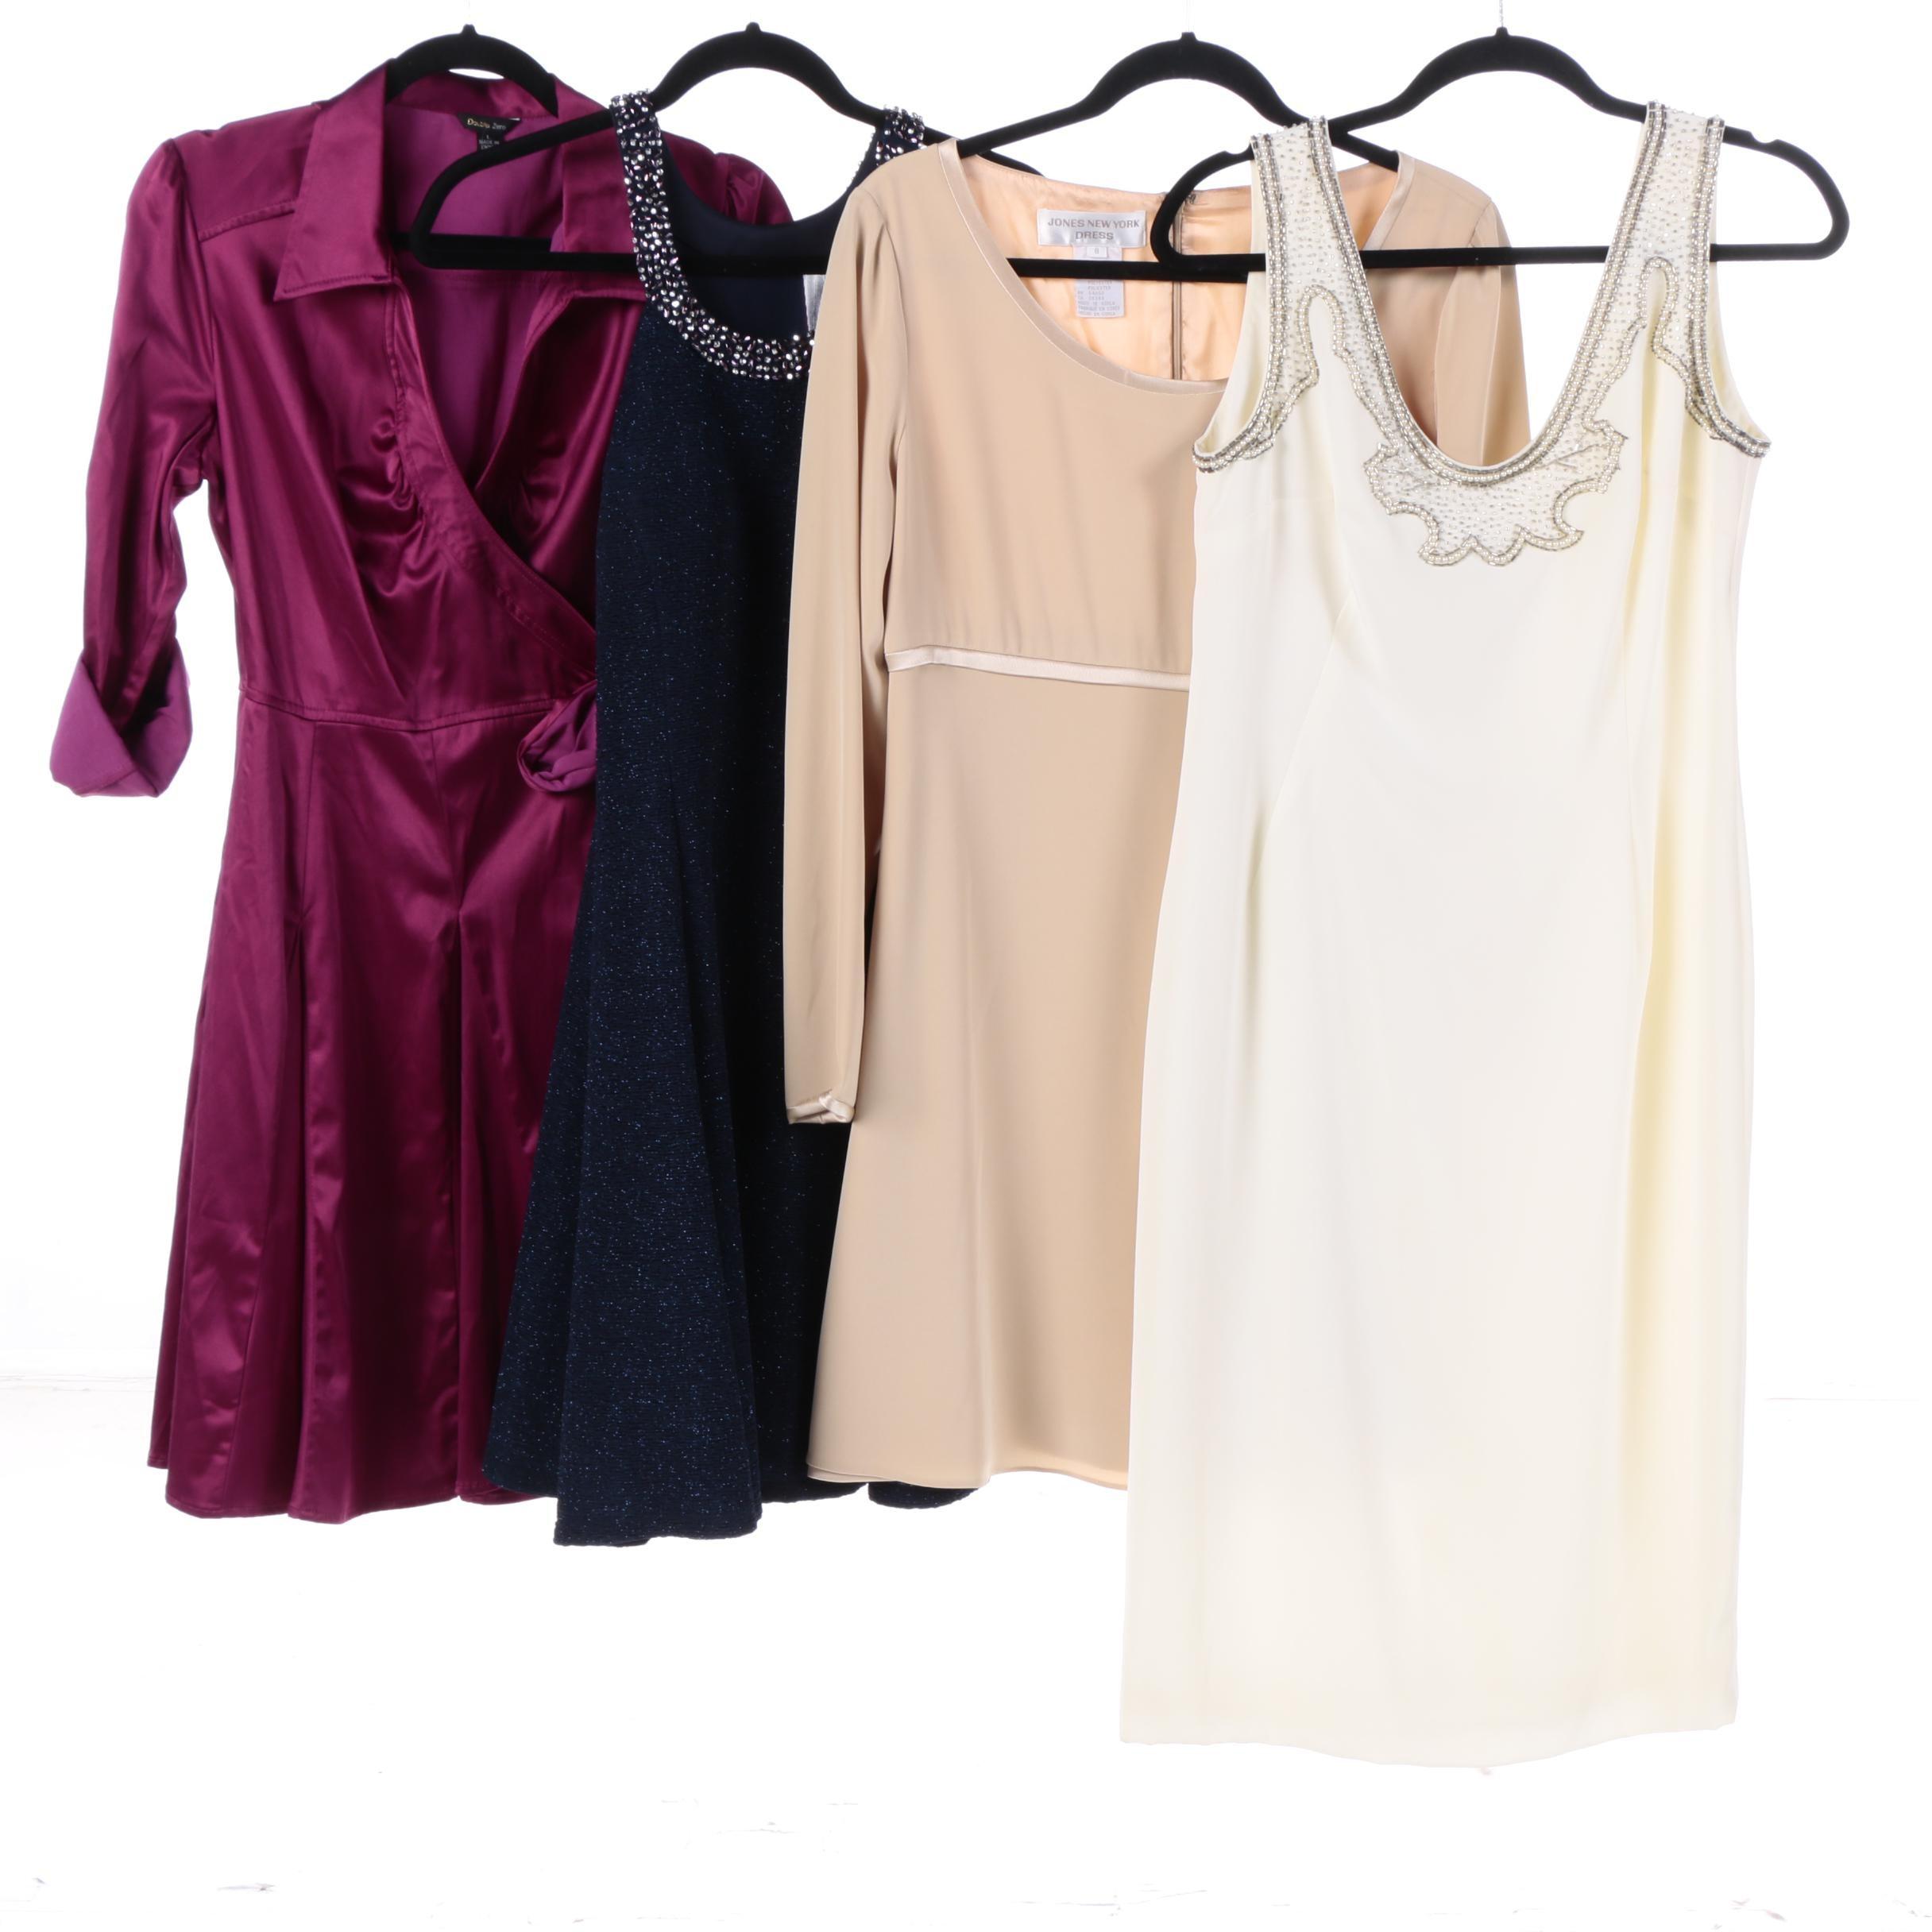 Cocktail Dresses Including Jones New York, Double Zero and Betsy & Adam